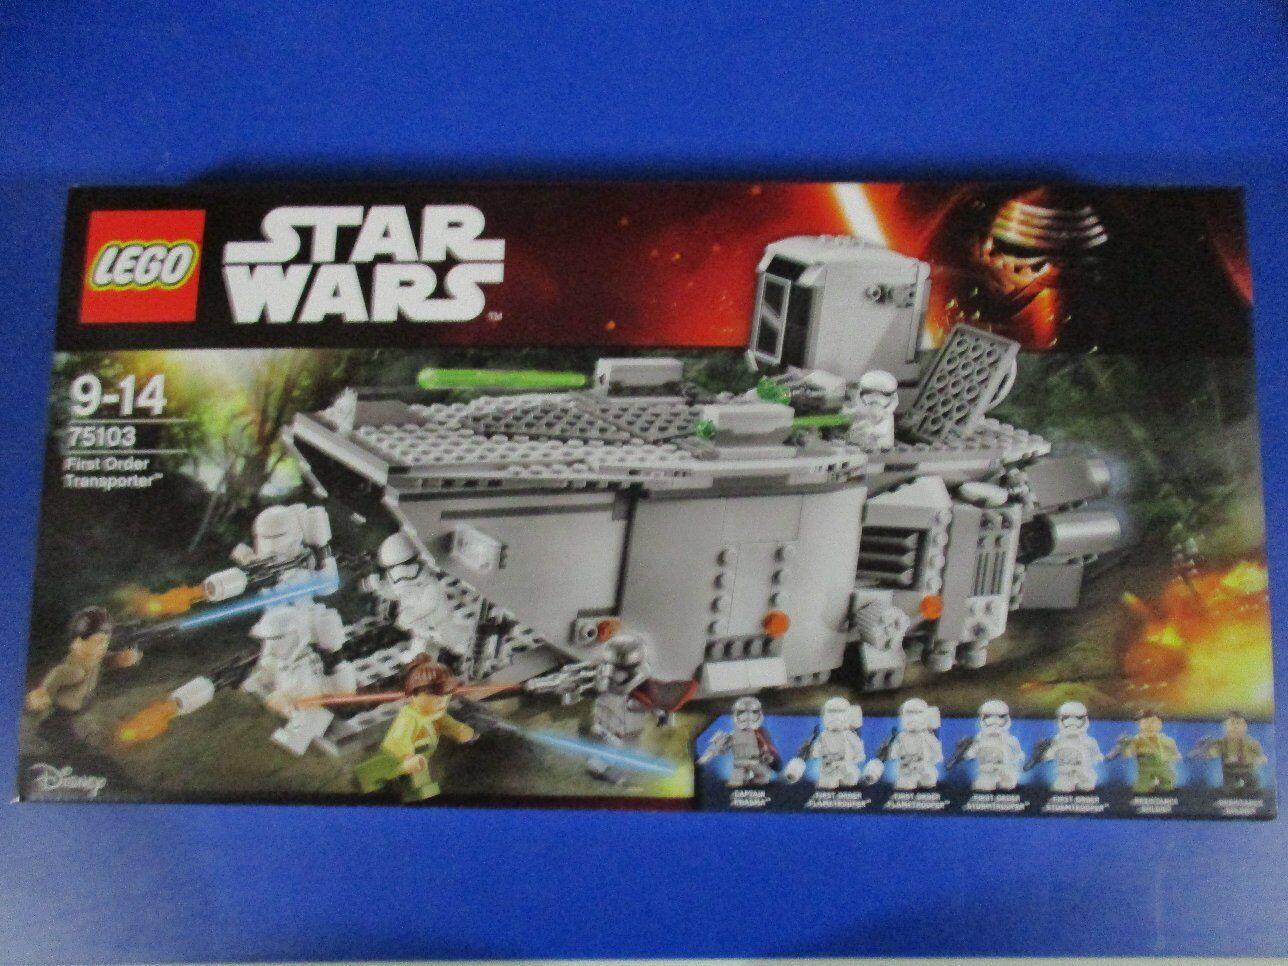 Lego Star Wars 75103 First Order transporteur Nouveau neuf neuf neuf dans sa boîte f4f805